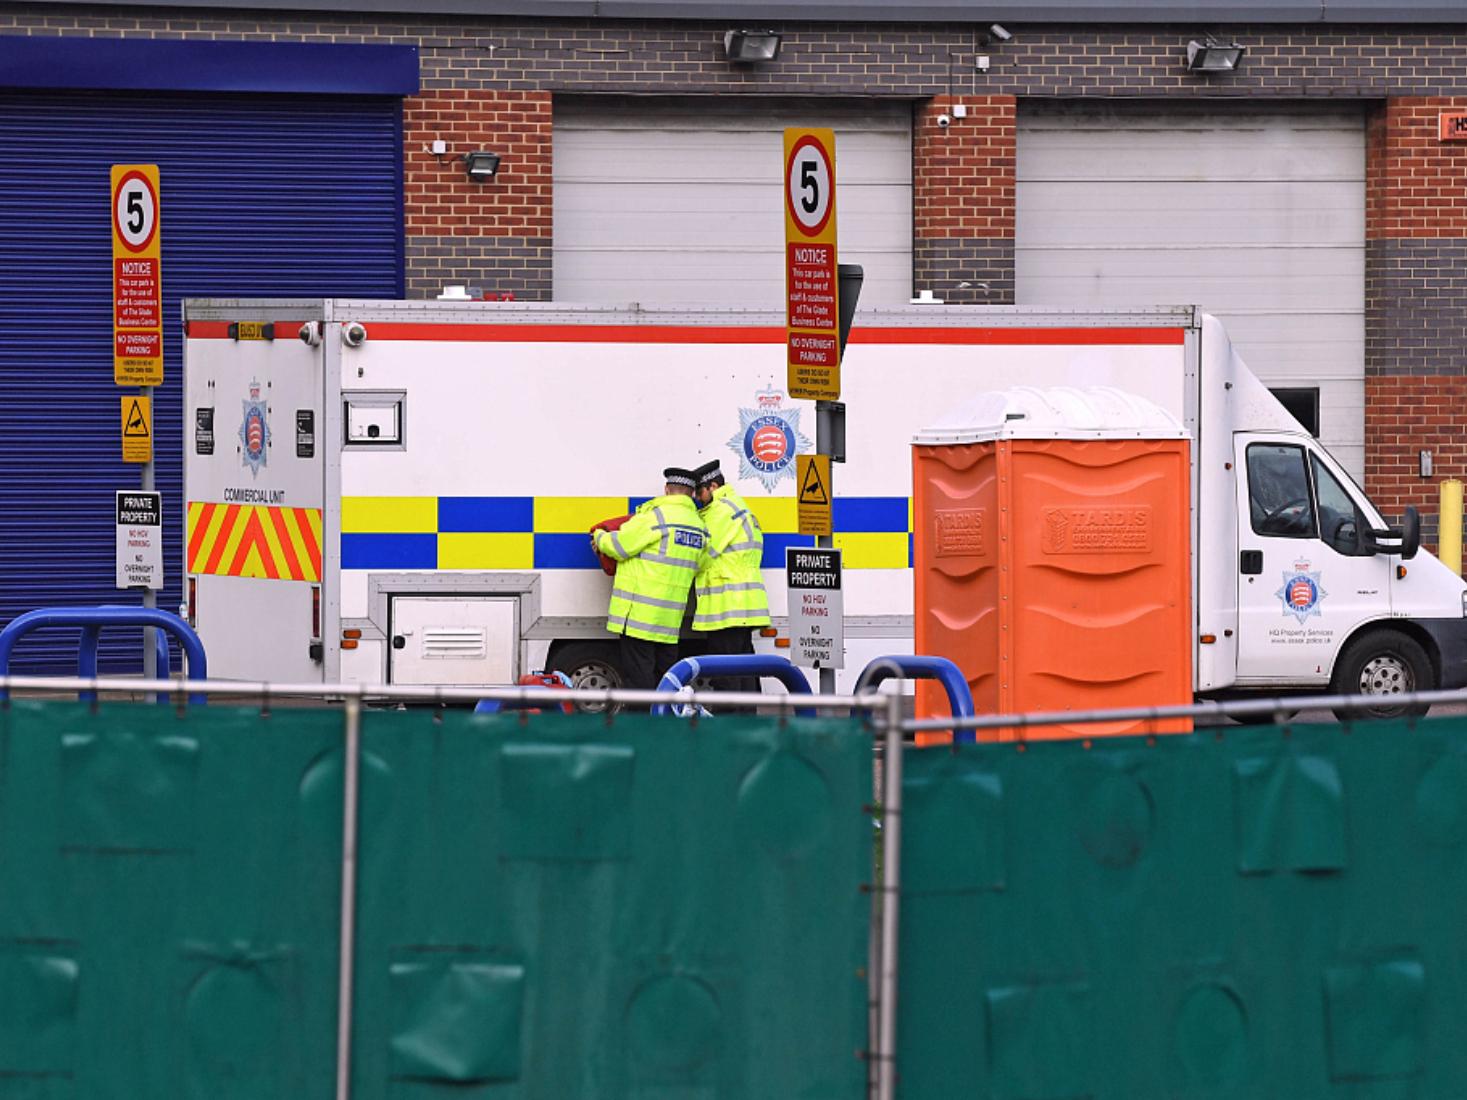 Second Vietnamese family fears son among 39 UK truck dead